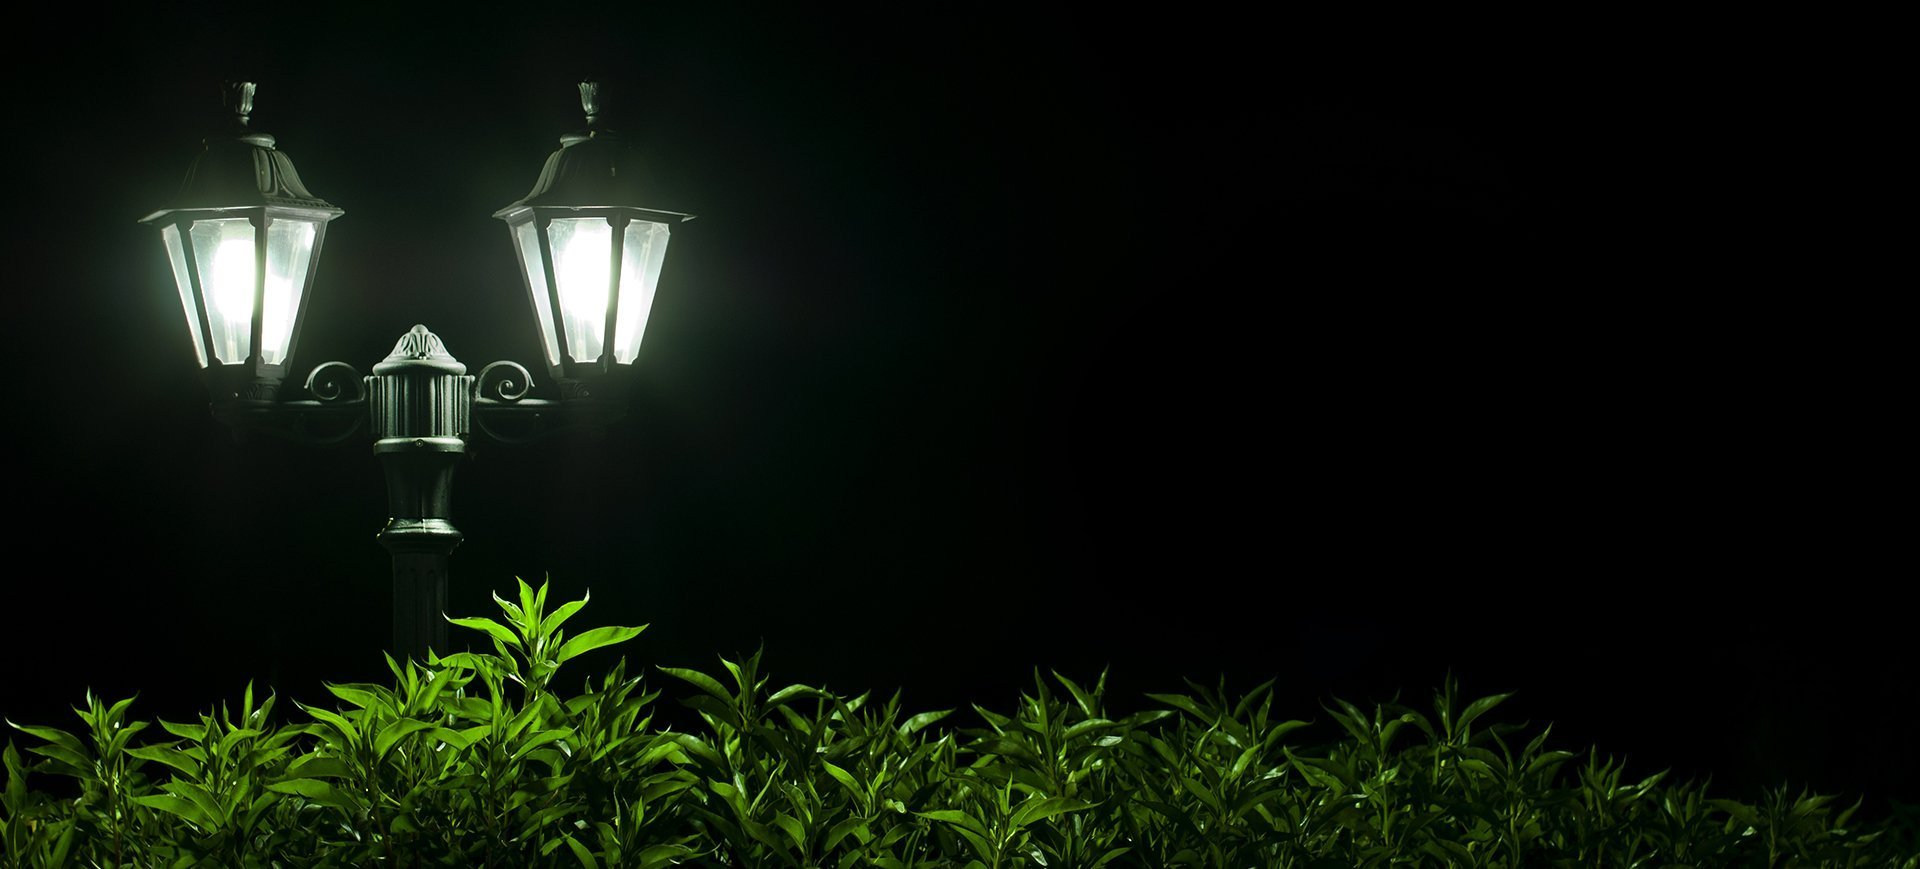 Lighting experts